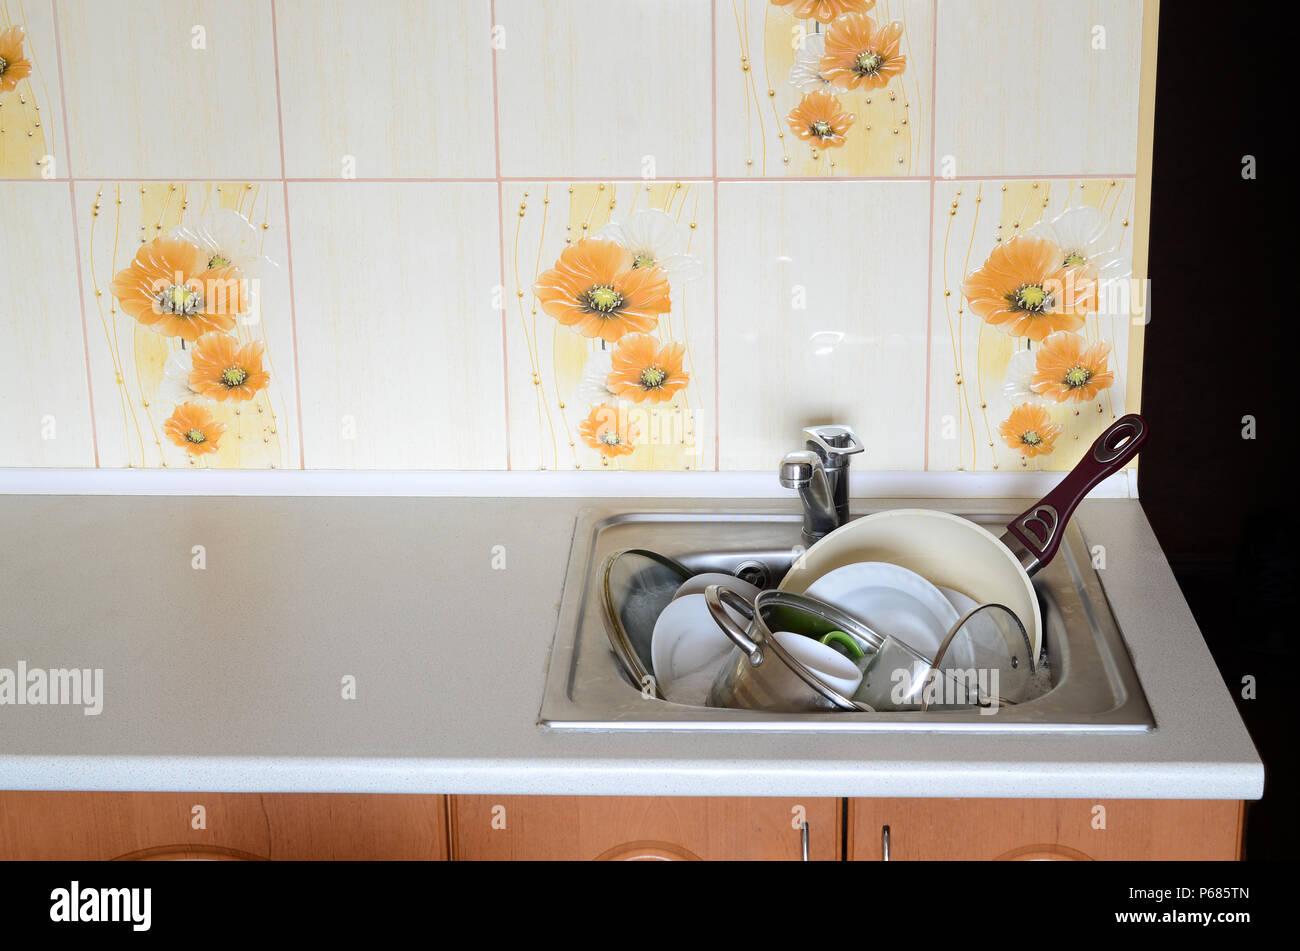 Großzügig Küchenspüle Wein Ideen - Küchen Ideen Modern ...